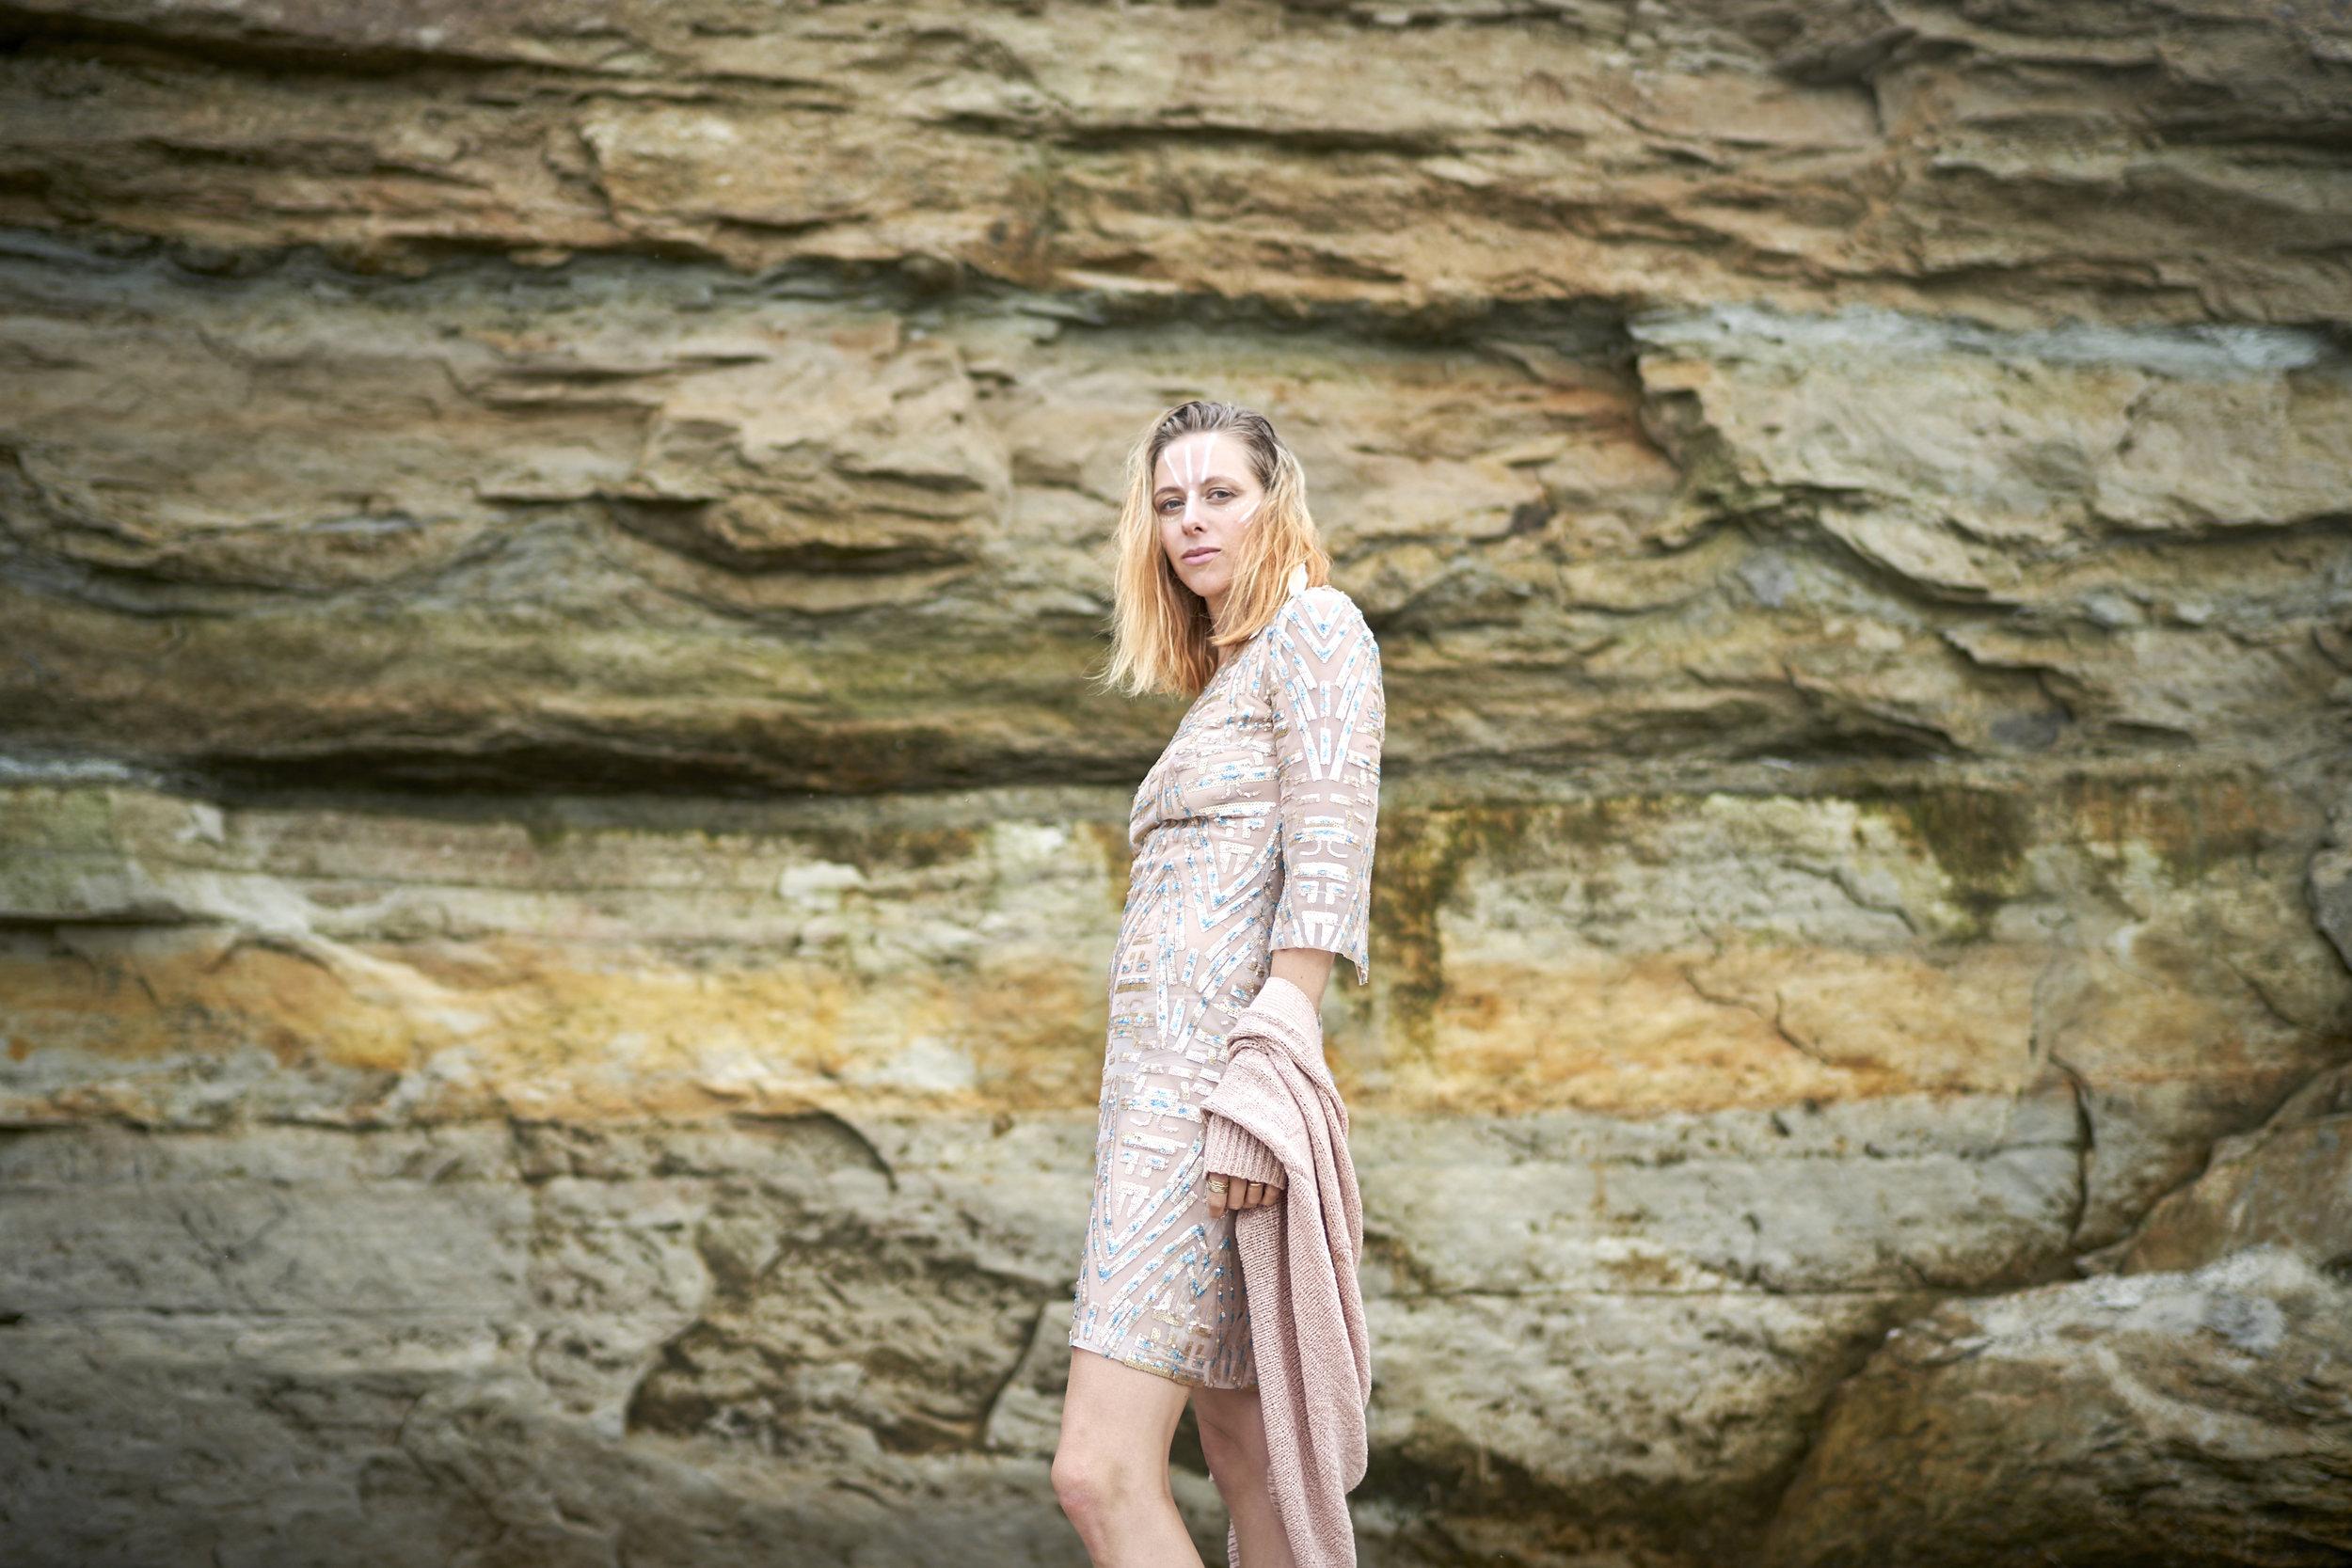 Kristi Kalluste, Founder of Bonobo / Photography: Katarina Tang / Stylist: Alli-Liis Vandel